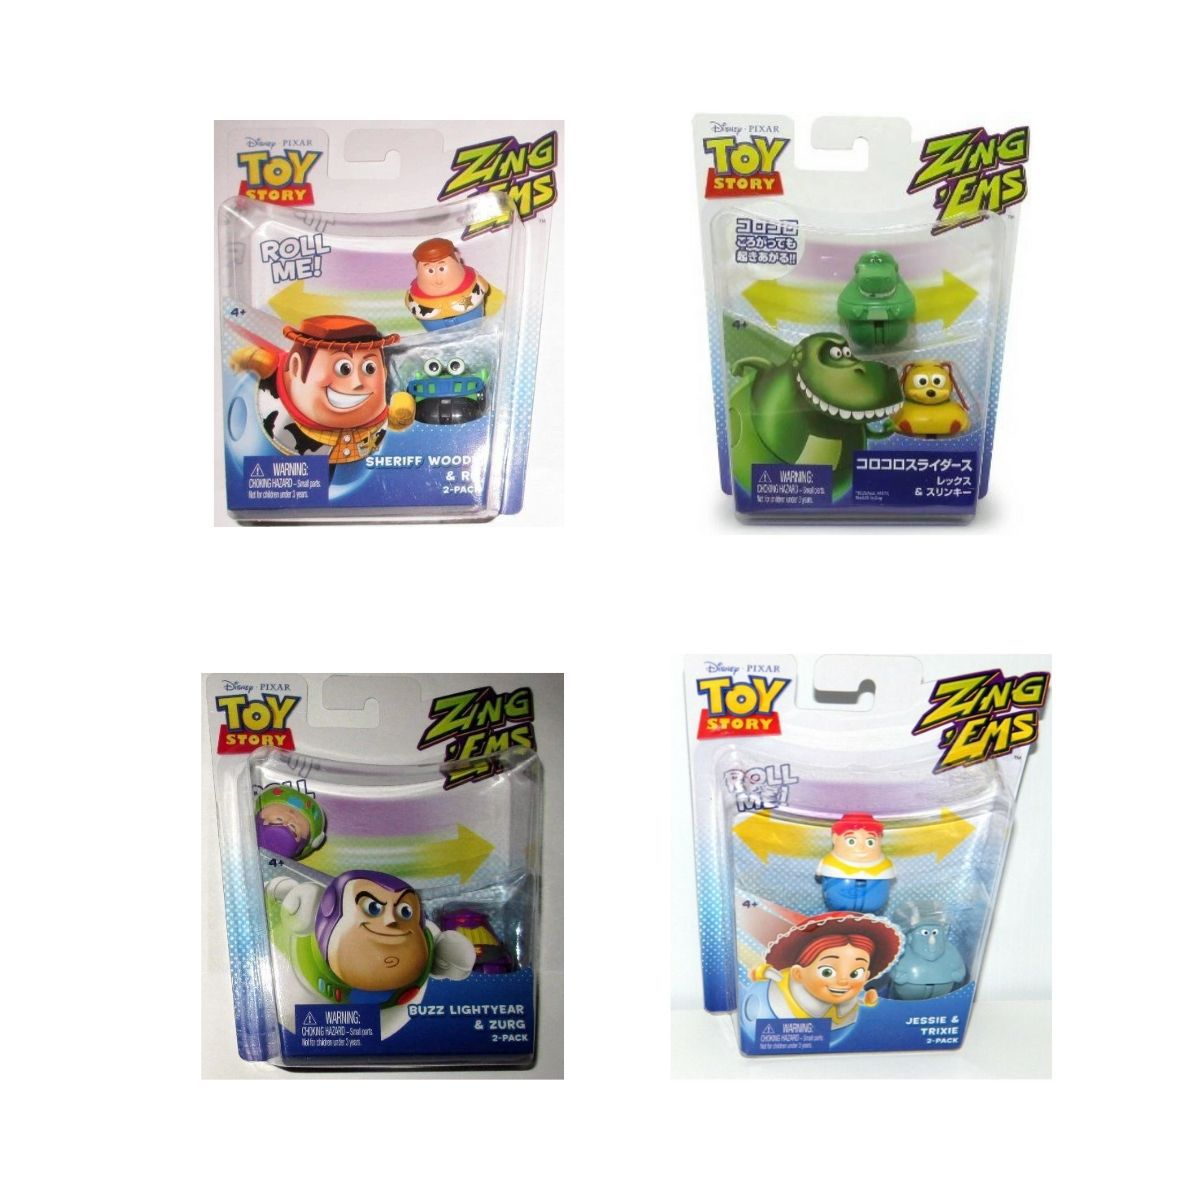 Conjunto de Bonecos Toy Story Zingems Mattel  - Game Land Brinquedos